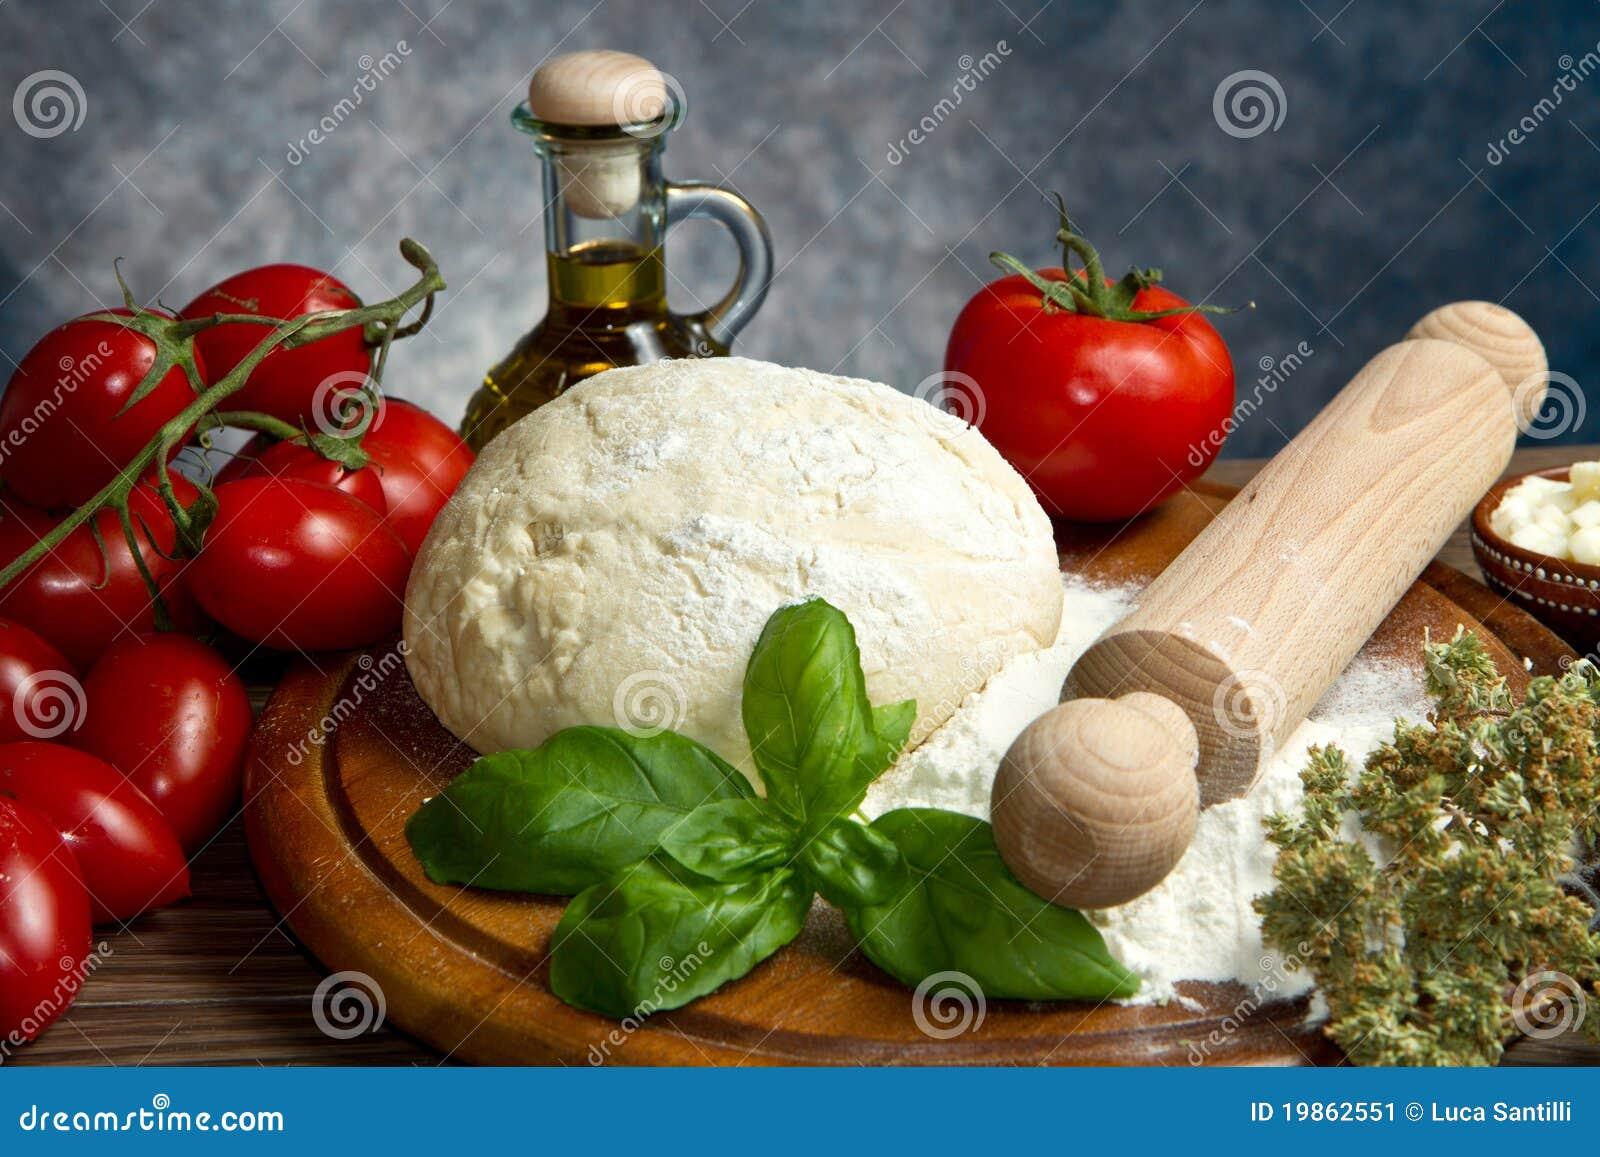 Pizza Ingredients Stock Image - Image: 19862551